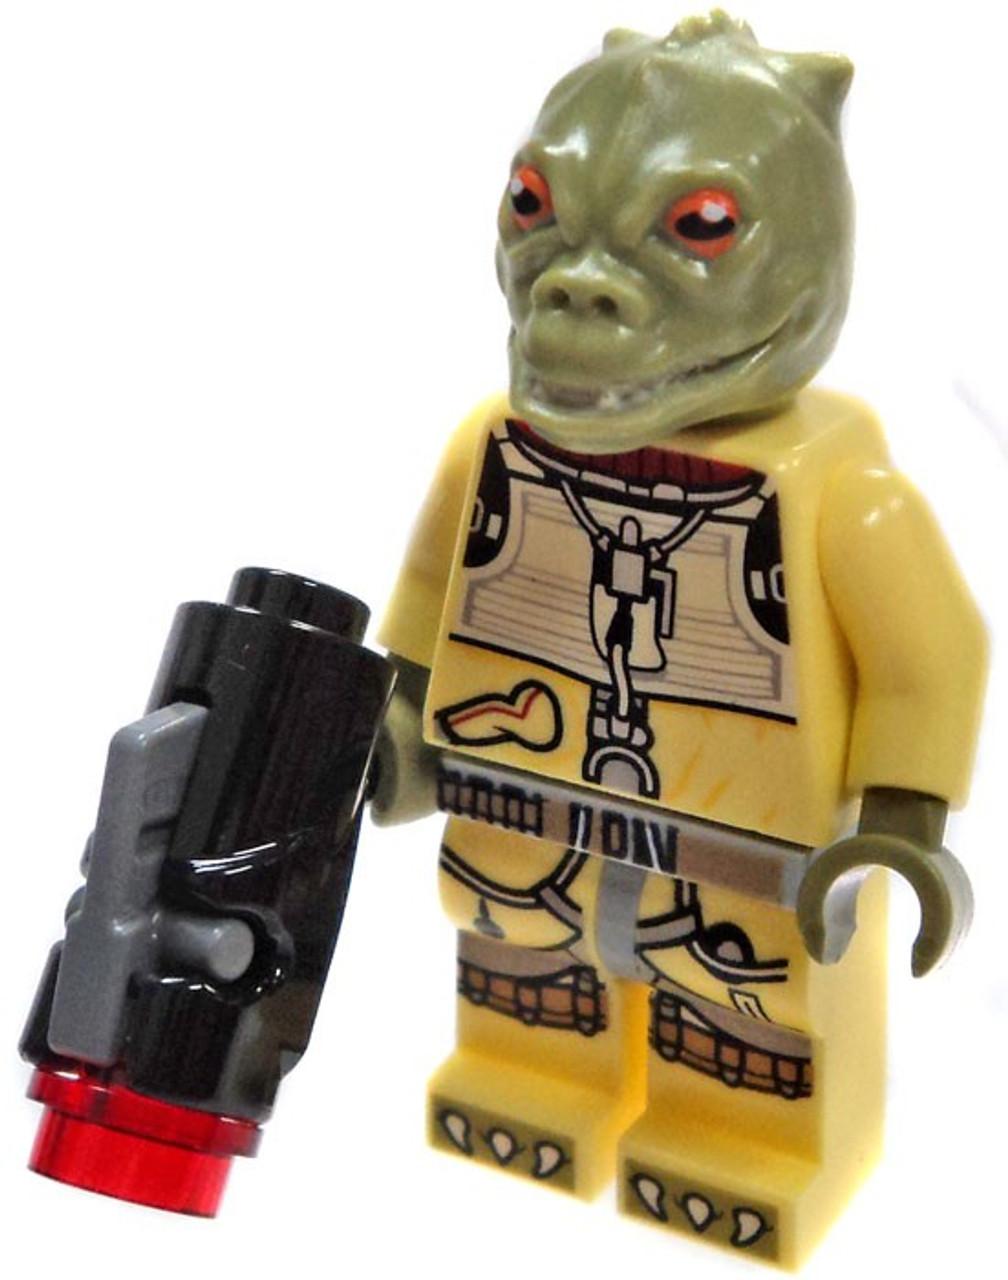 LEGO STAR WARS Dengar MINIFIG new from Lego set #75167